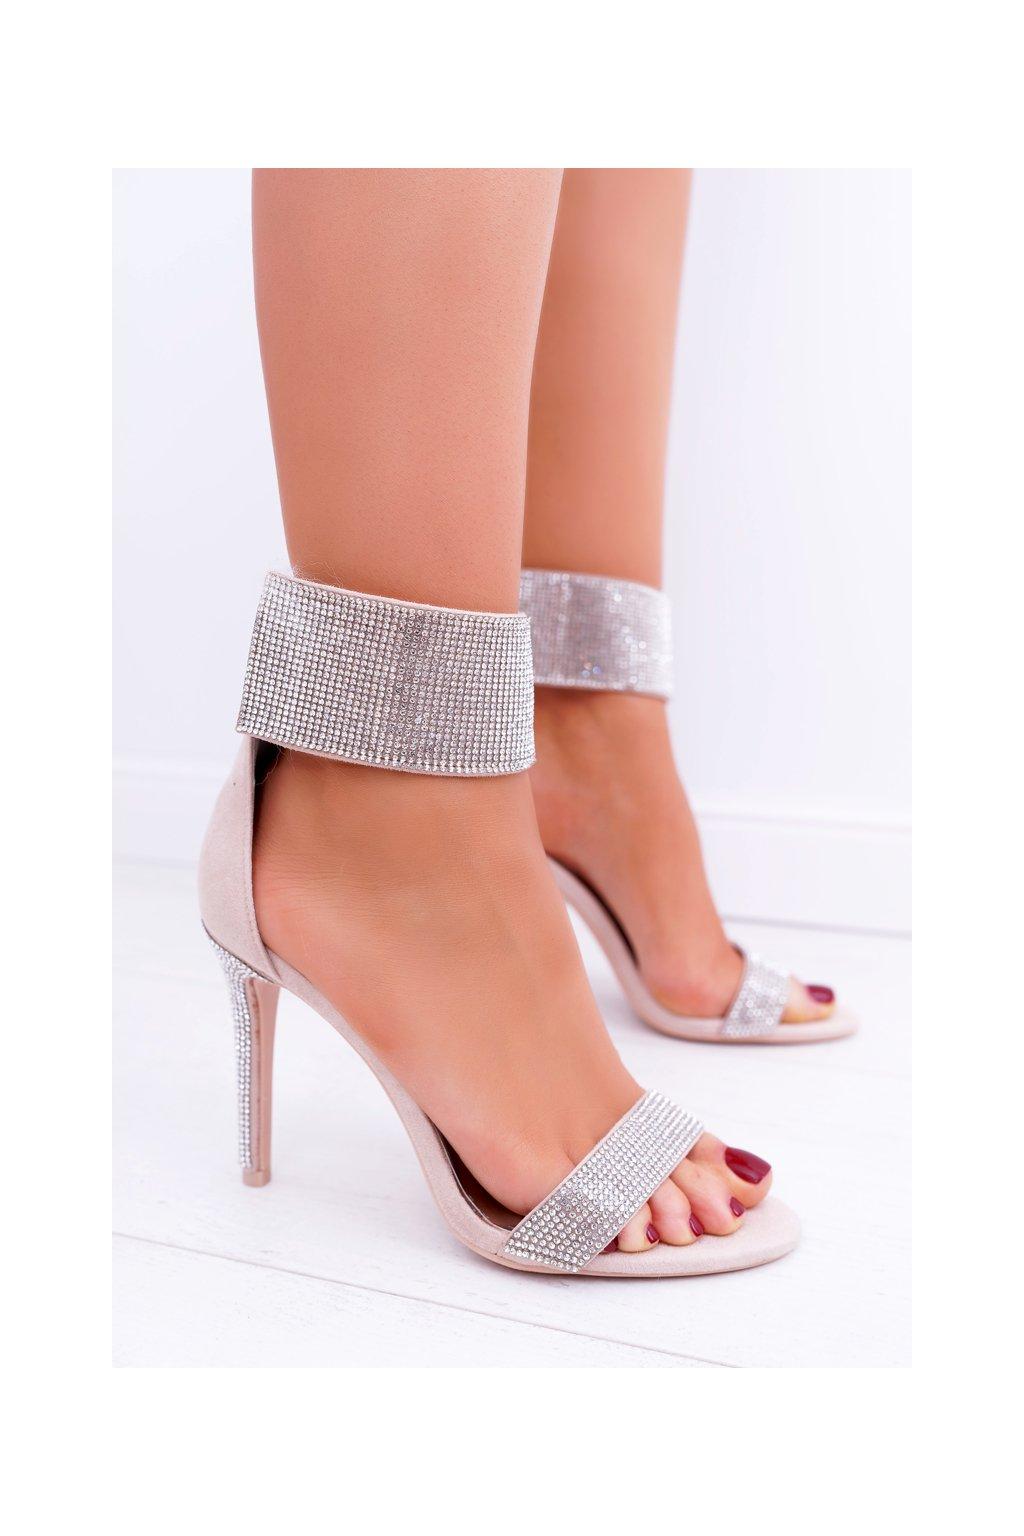 Dámske Sandále na podpätku Lu Boo so zirkónmi na suchý zips Show